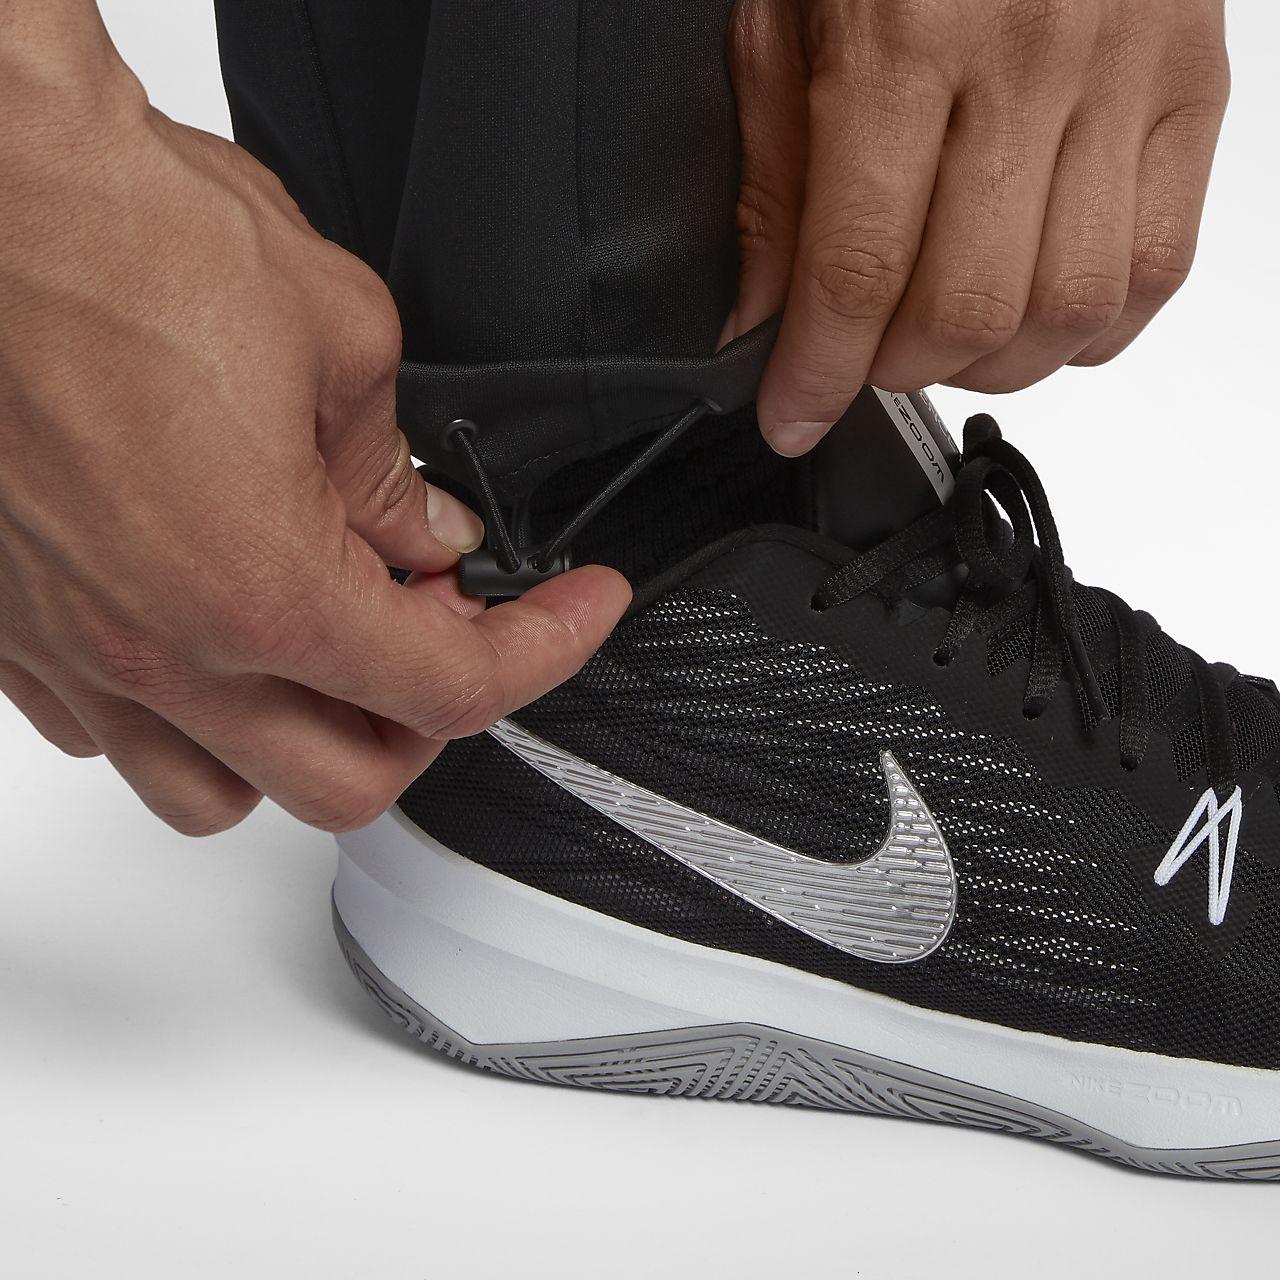 c12f1b4af285 Nike Therma Elite Men s Basketball Pants. Nike.com